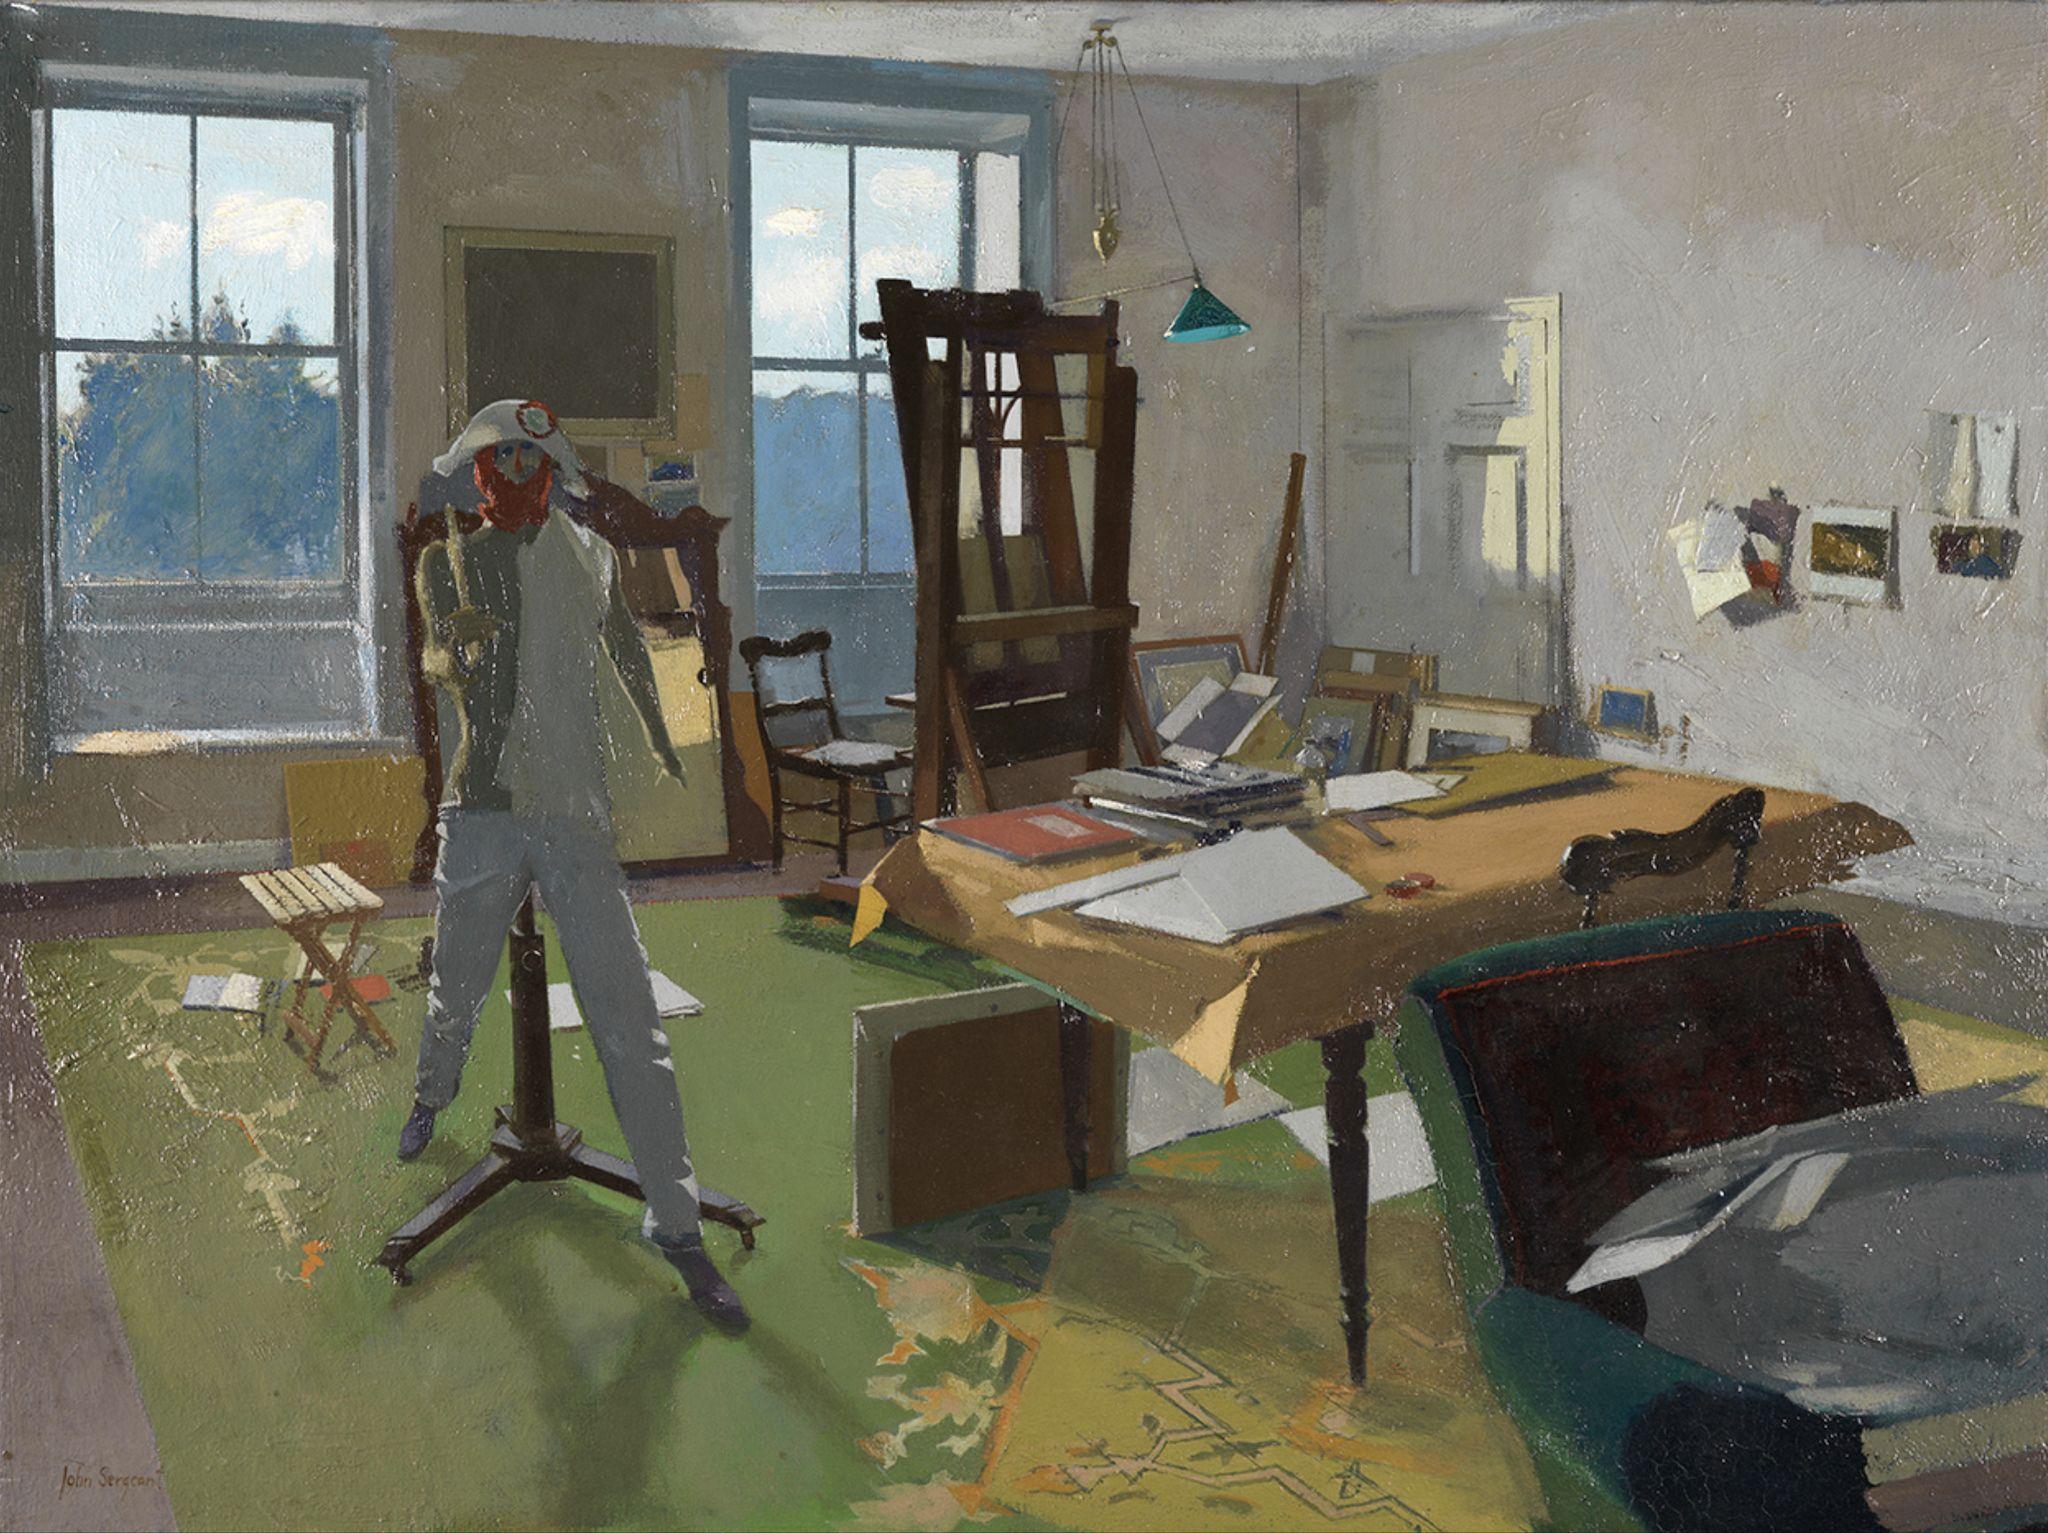 John Sergeant The Artist S Studio With Images John Ward